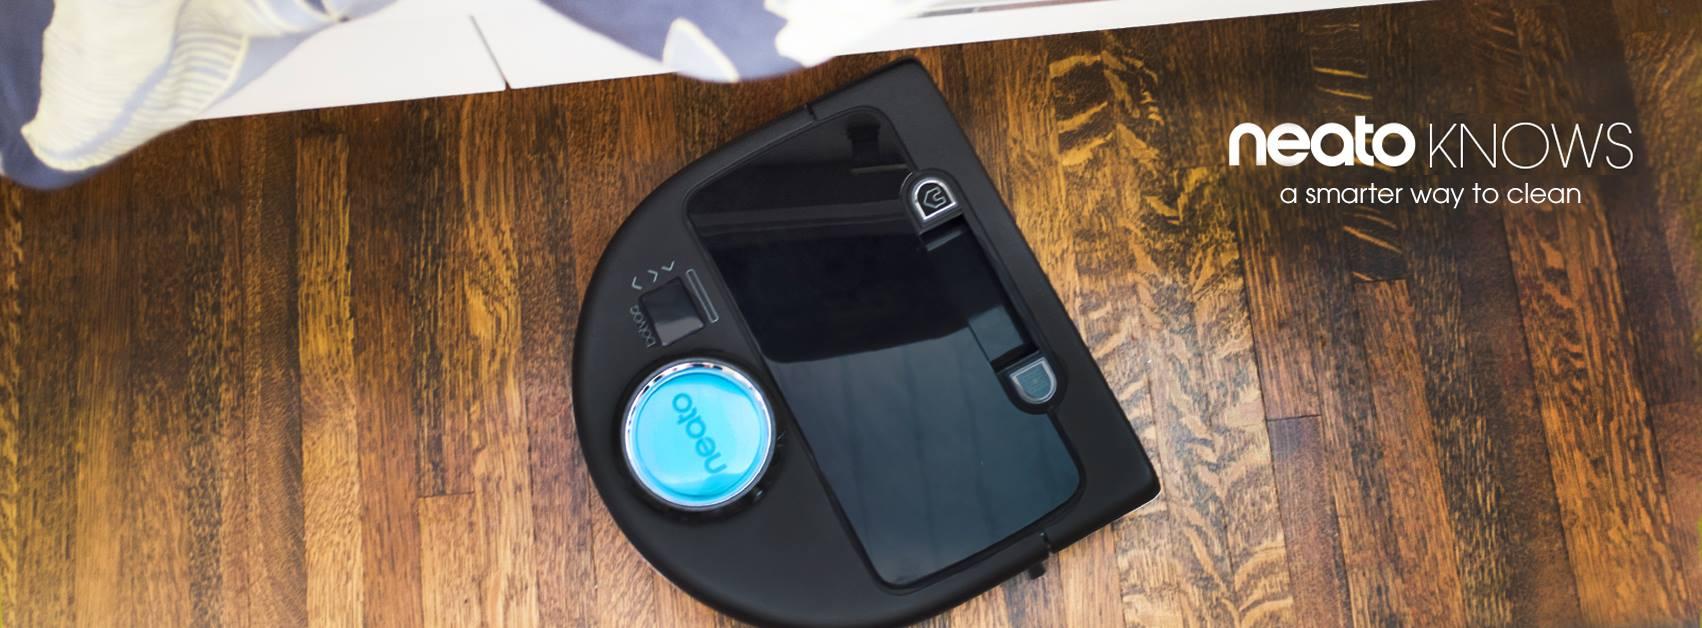 neato robotics botvac d85 achat aspirateur robot. Black Bedroom Furniture Sets. Home Design Ideas